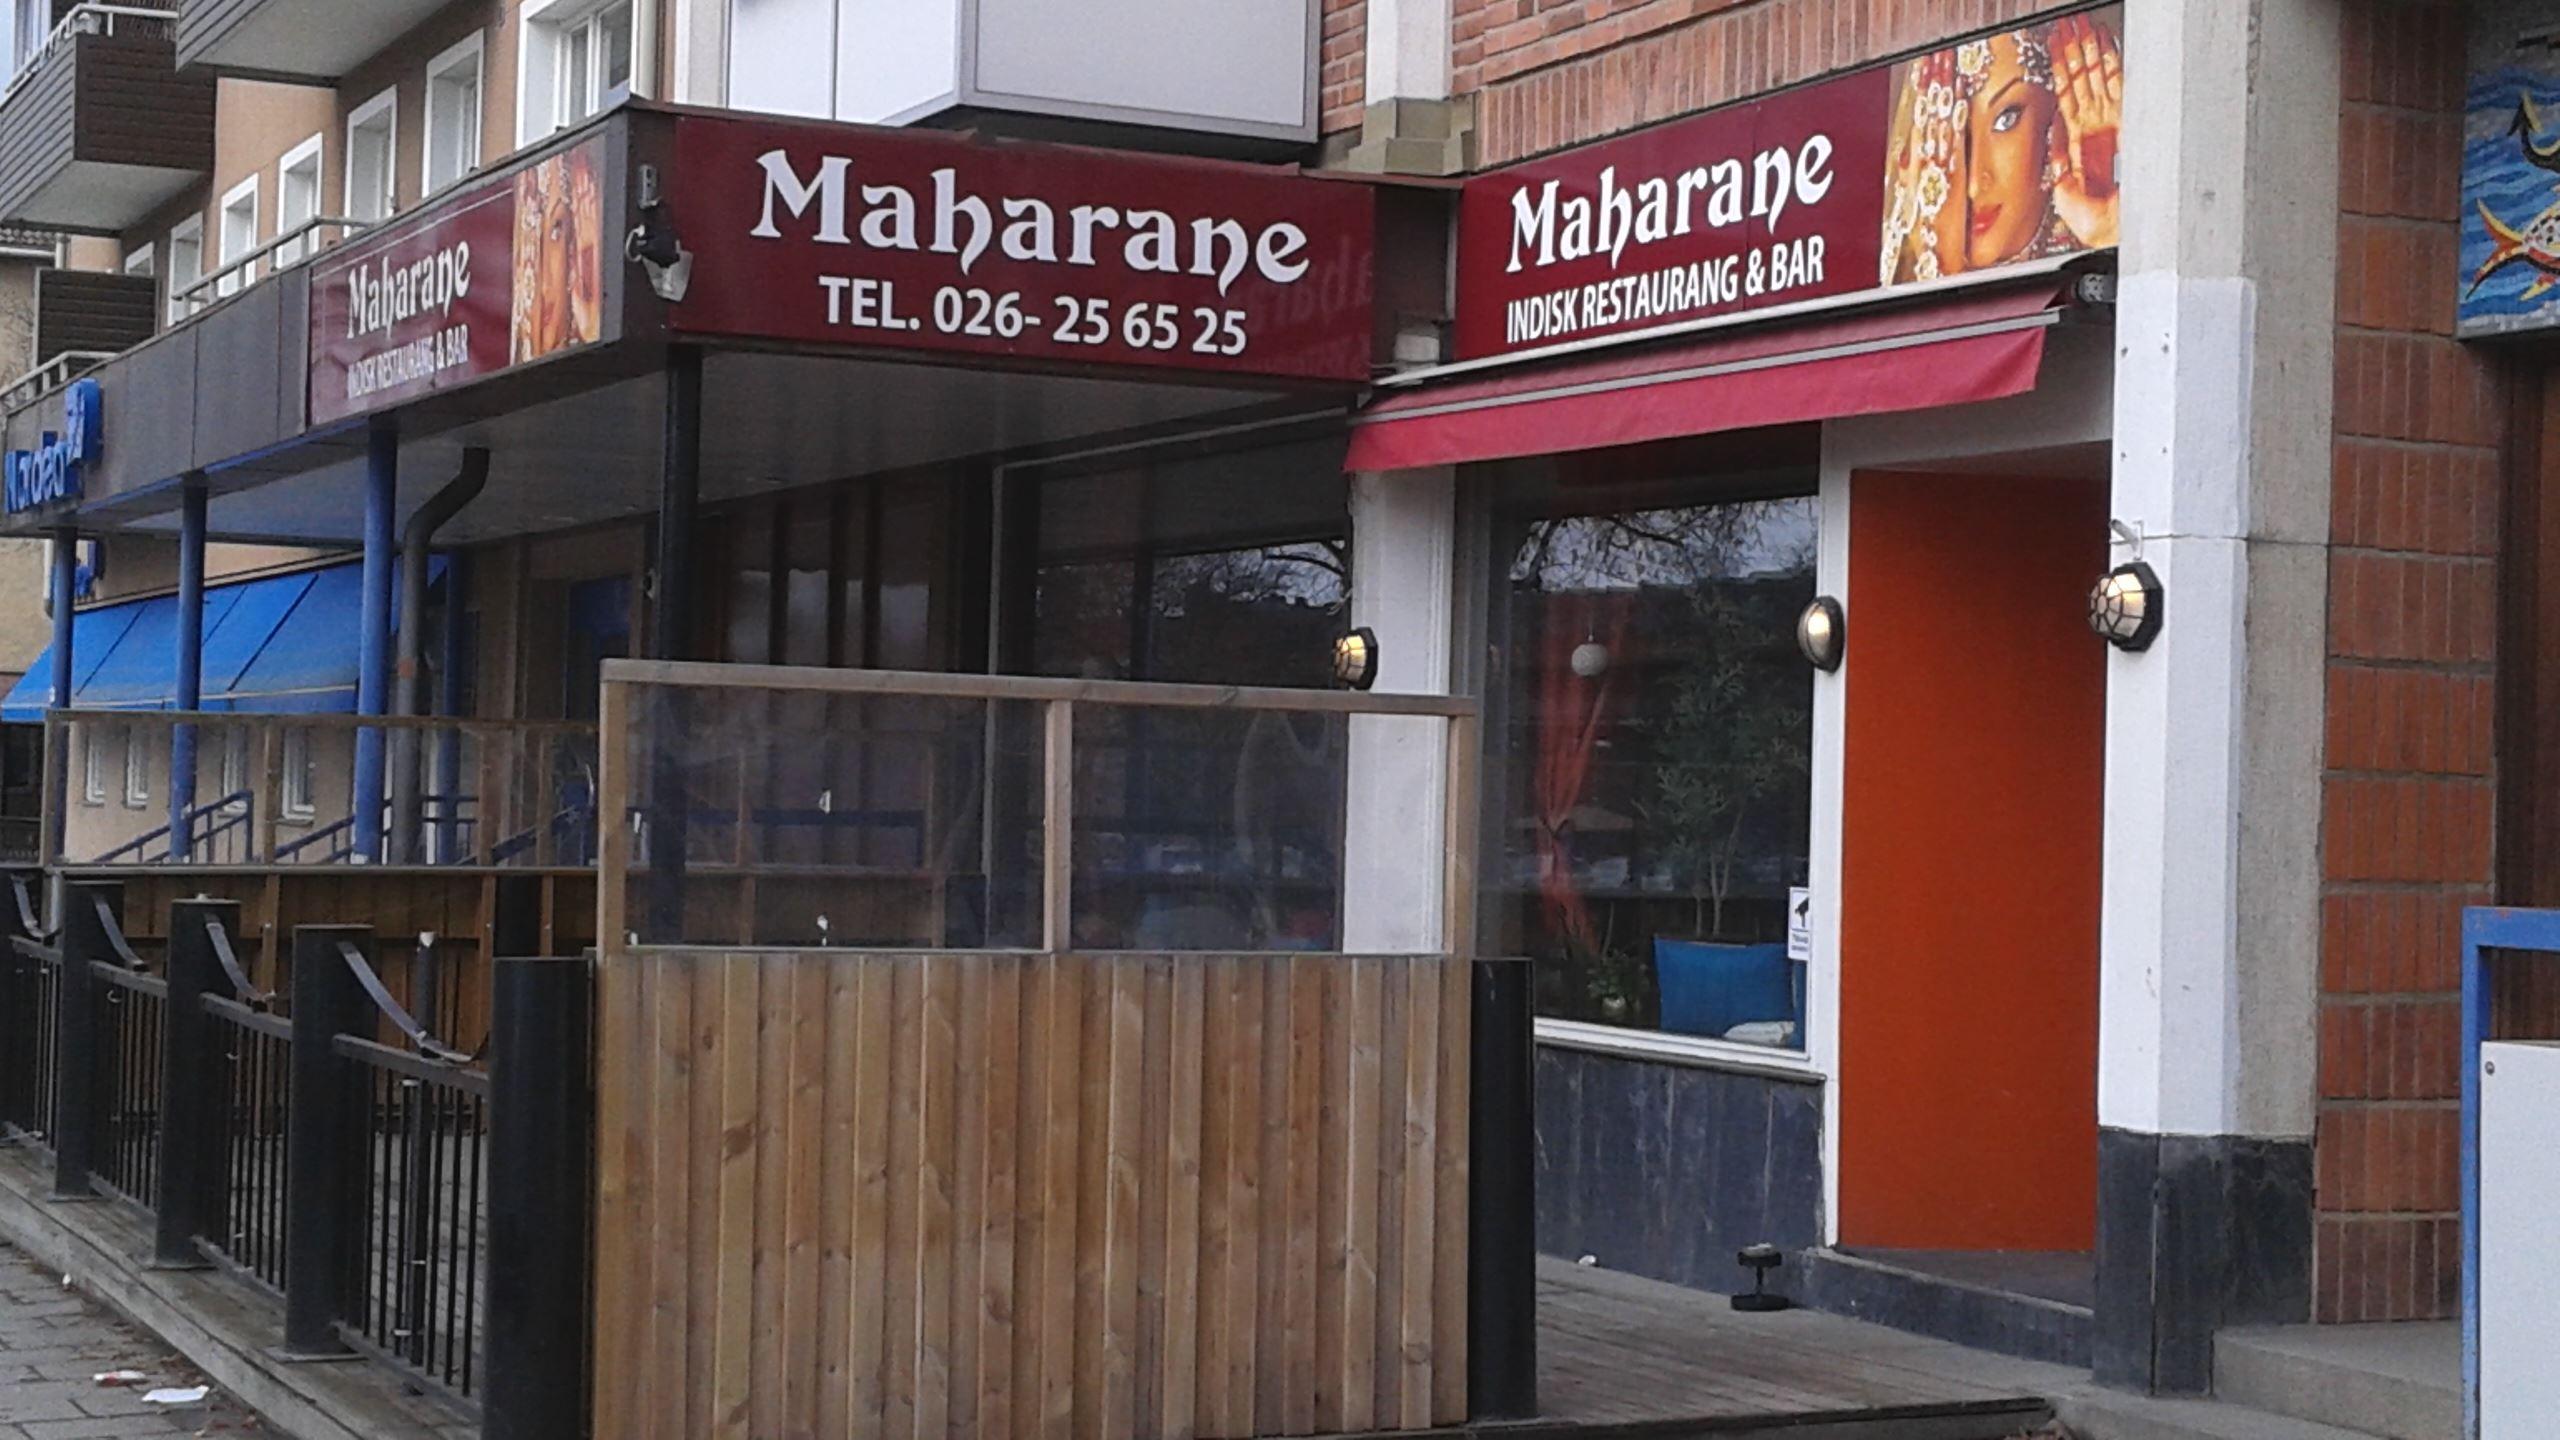 Maharane